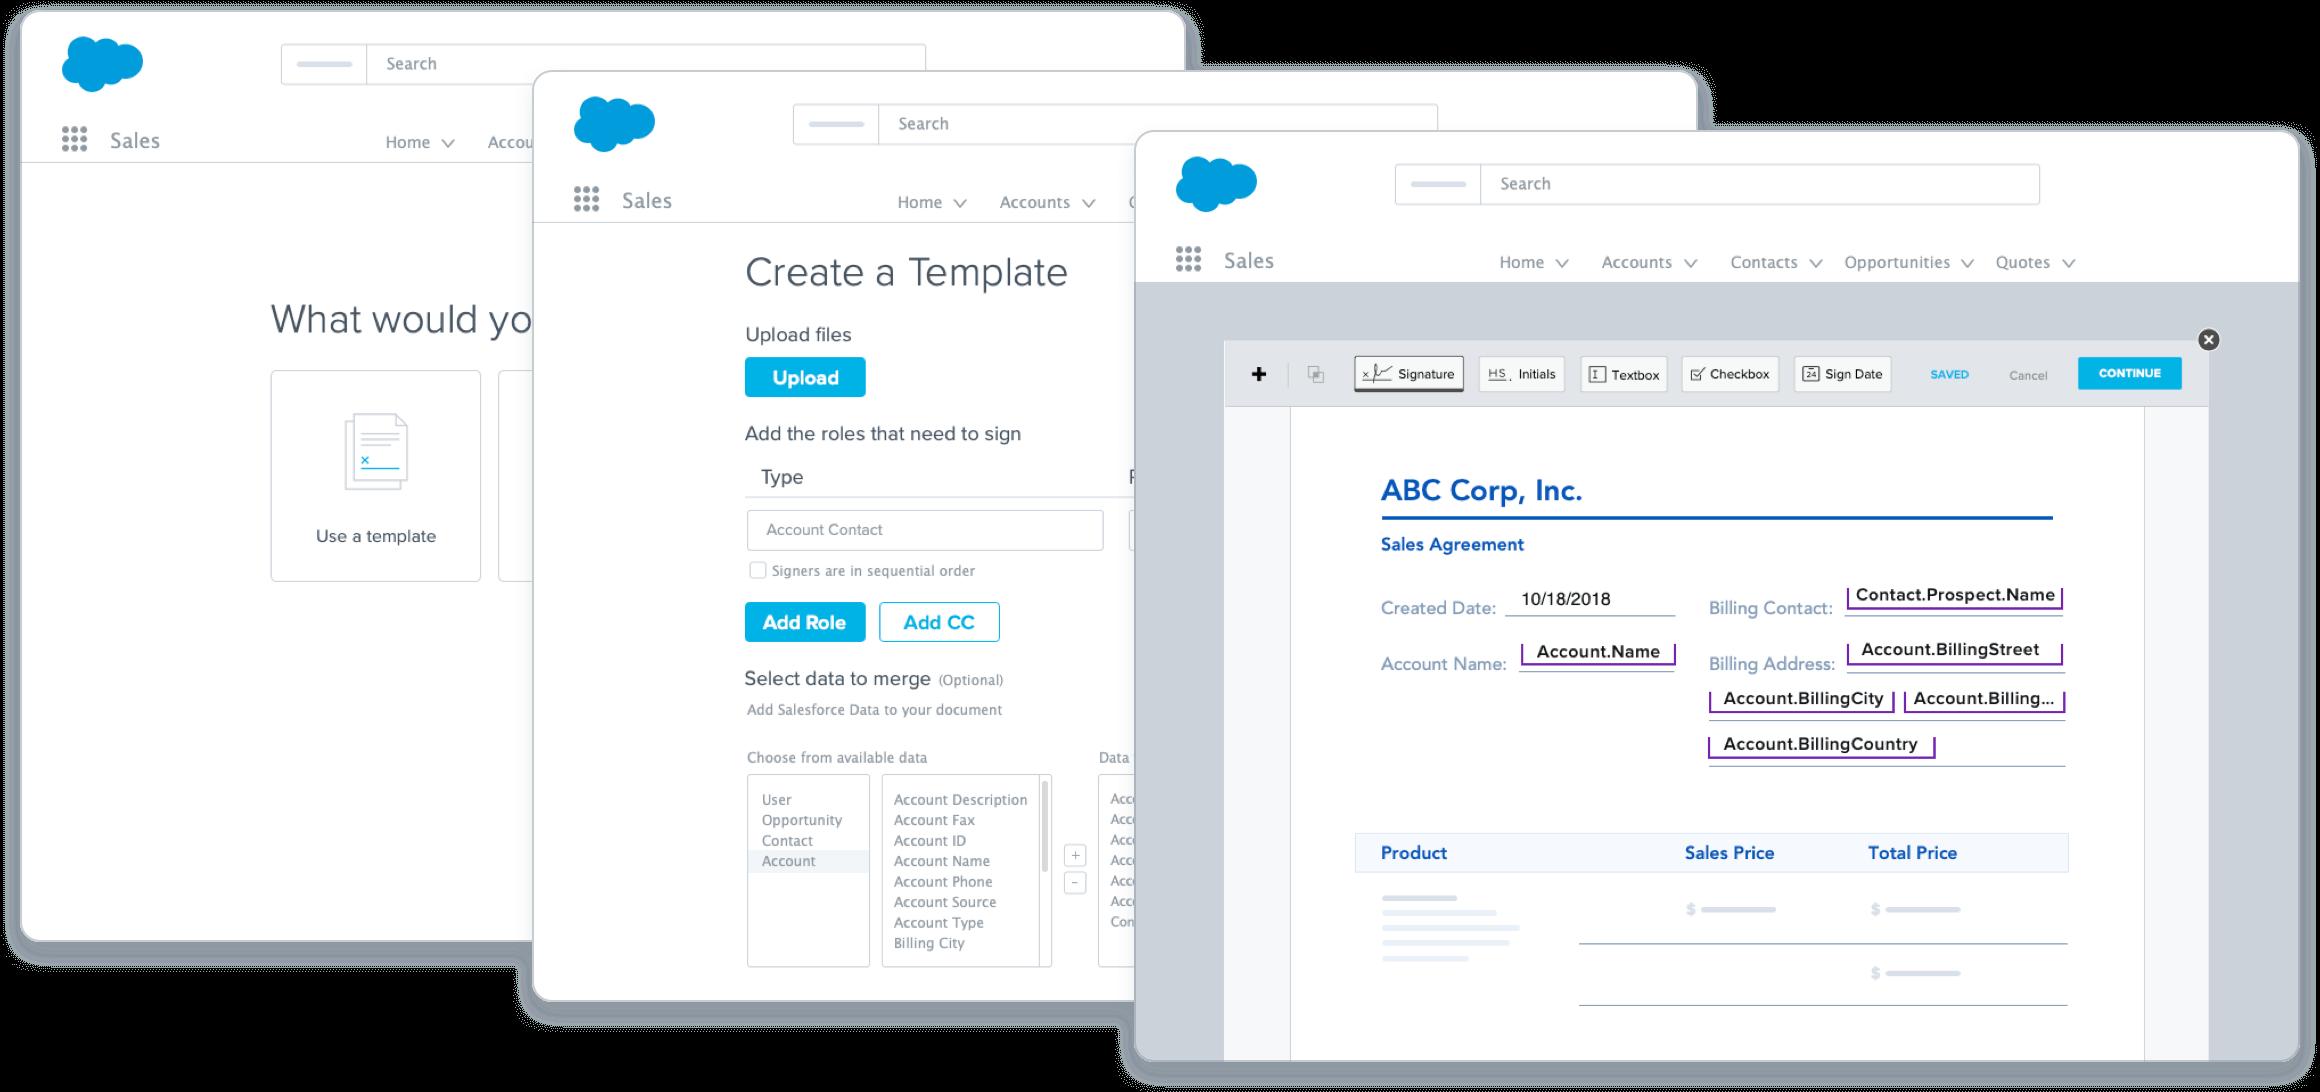 Image Salesforce